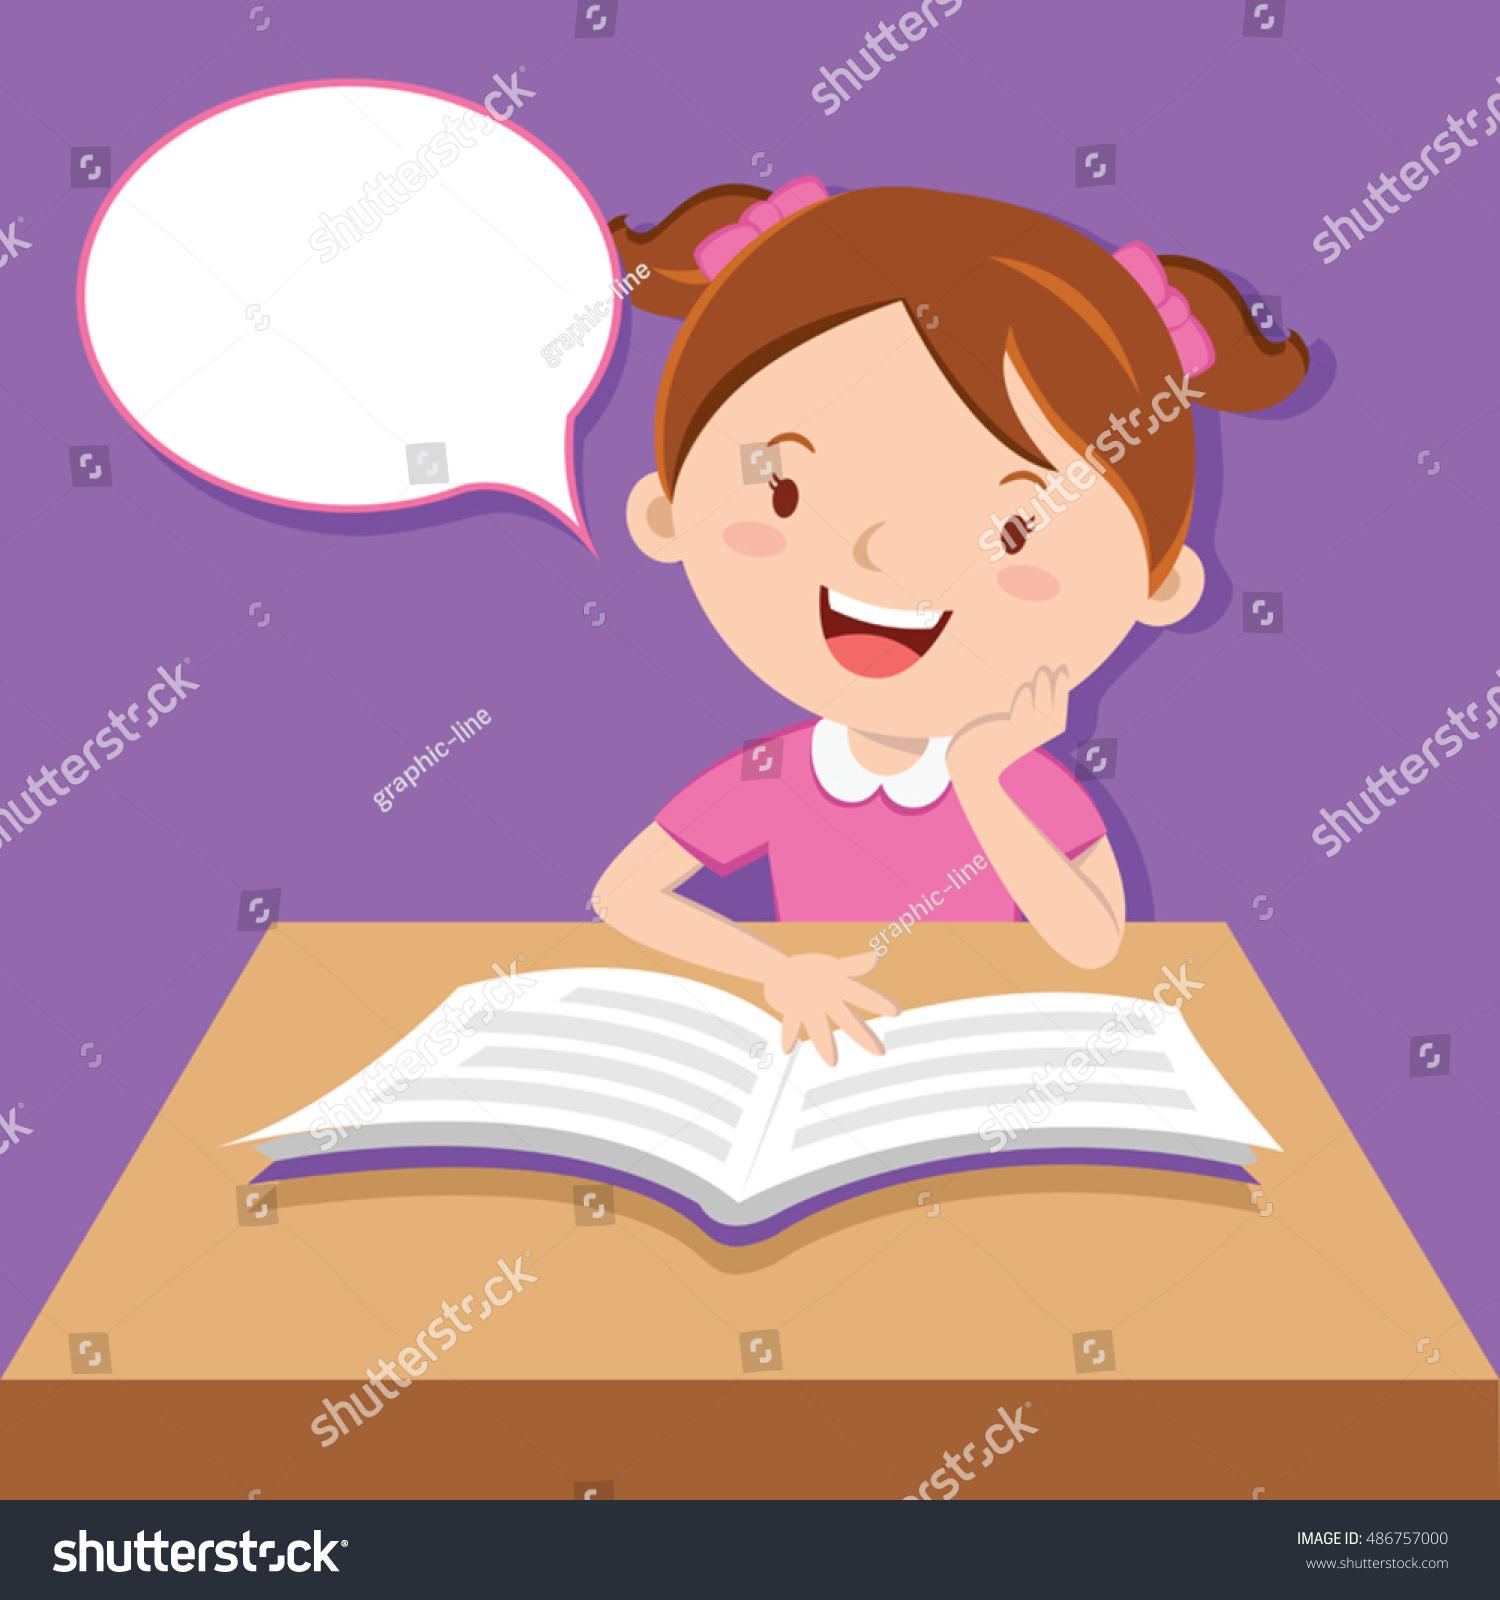 Cute Girl Reading Book Stock Vector 486757000 - Shutterstock